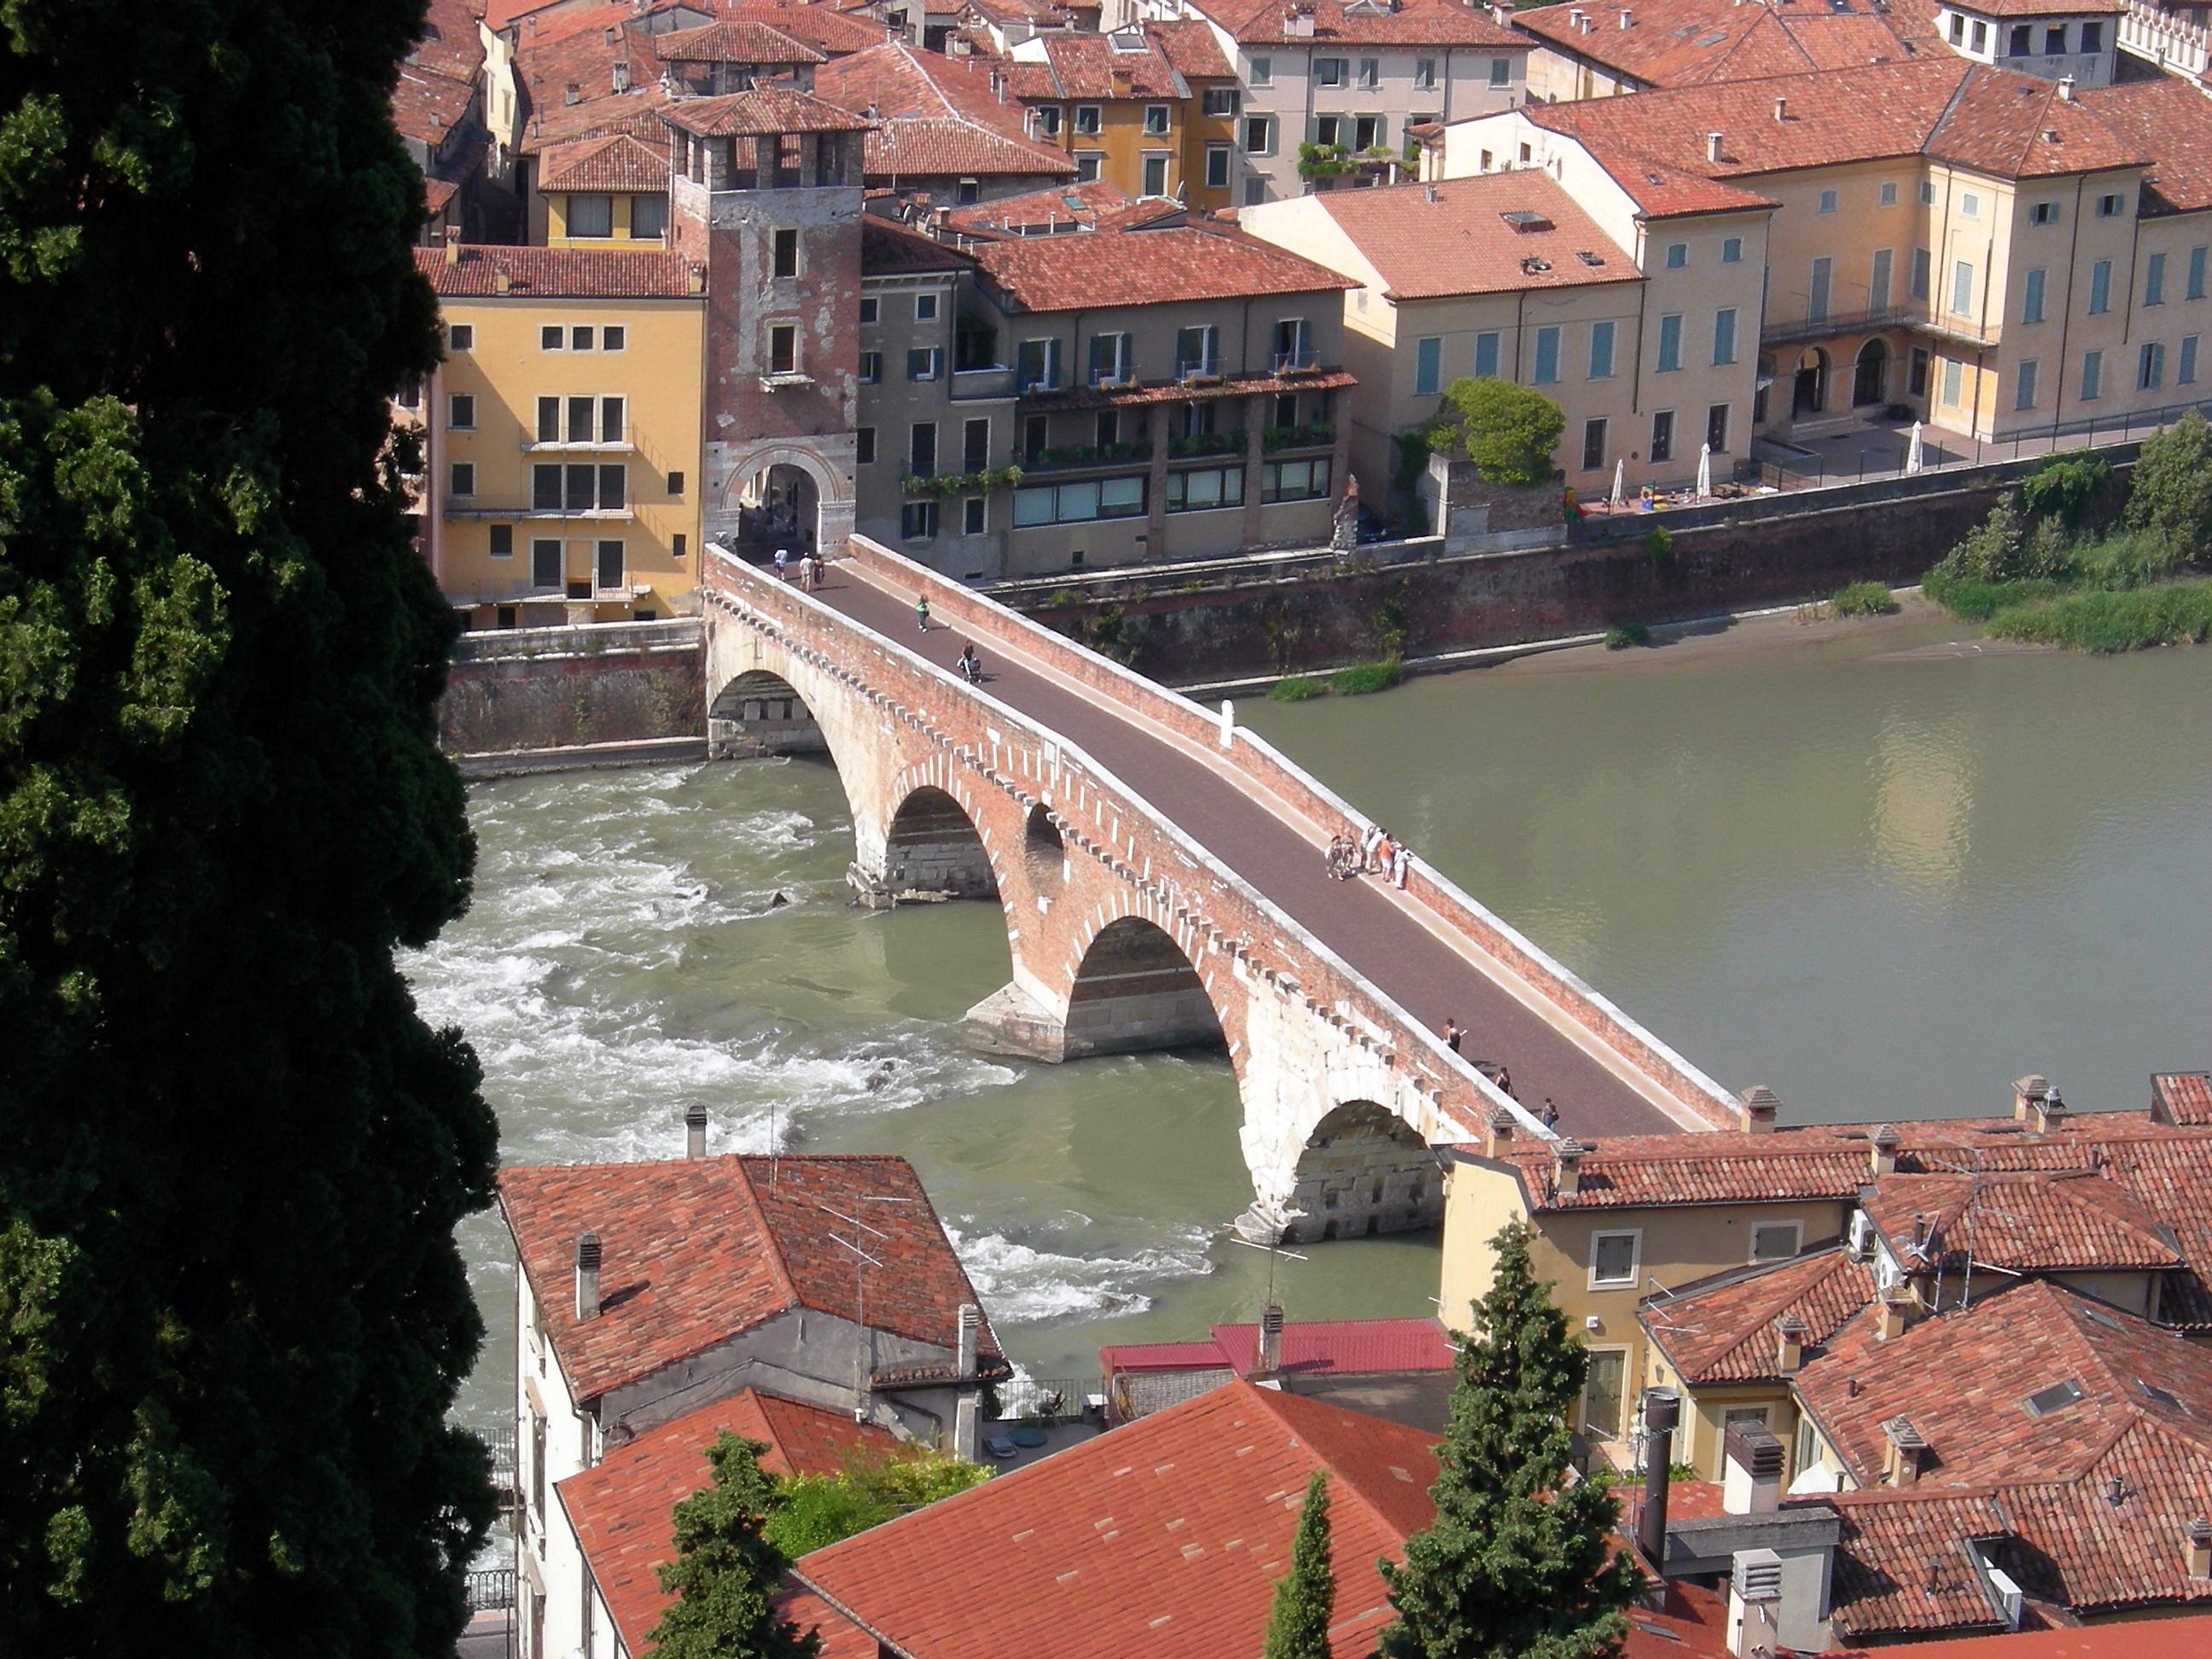 Walking tour in Verona (2 hours)